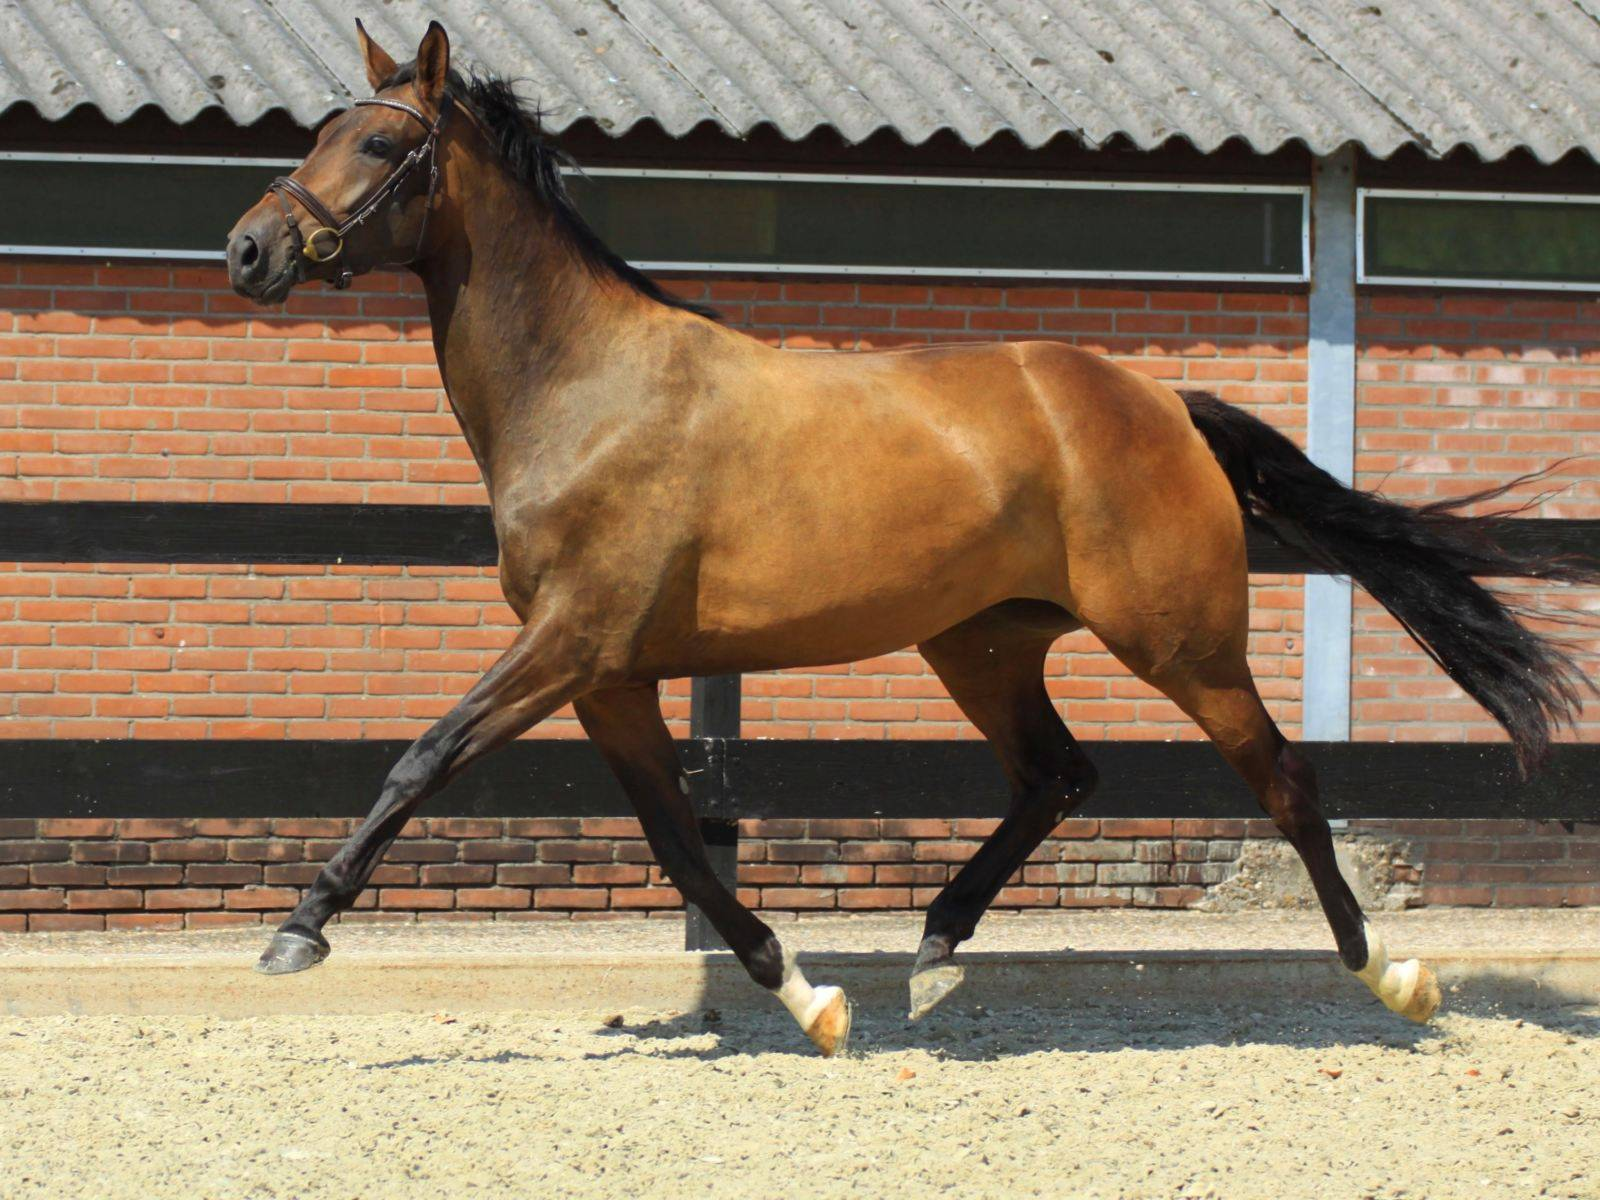 Warmblood Dressage Horses for Sale USA